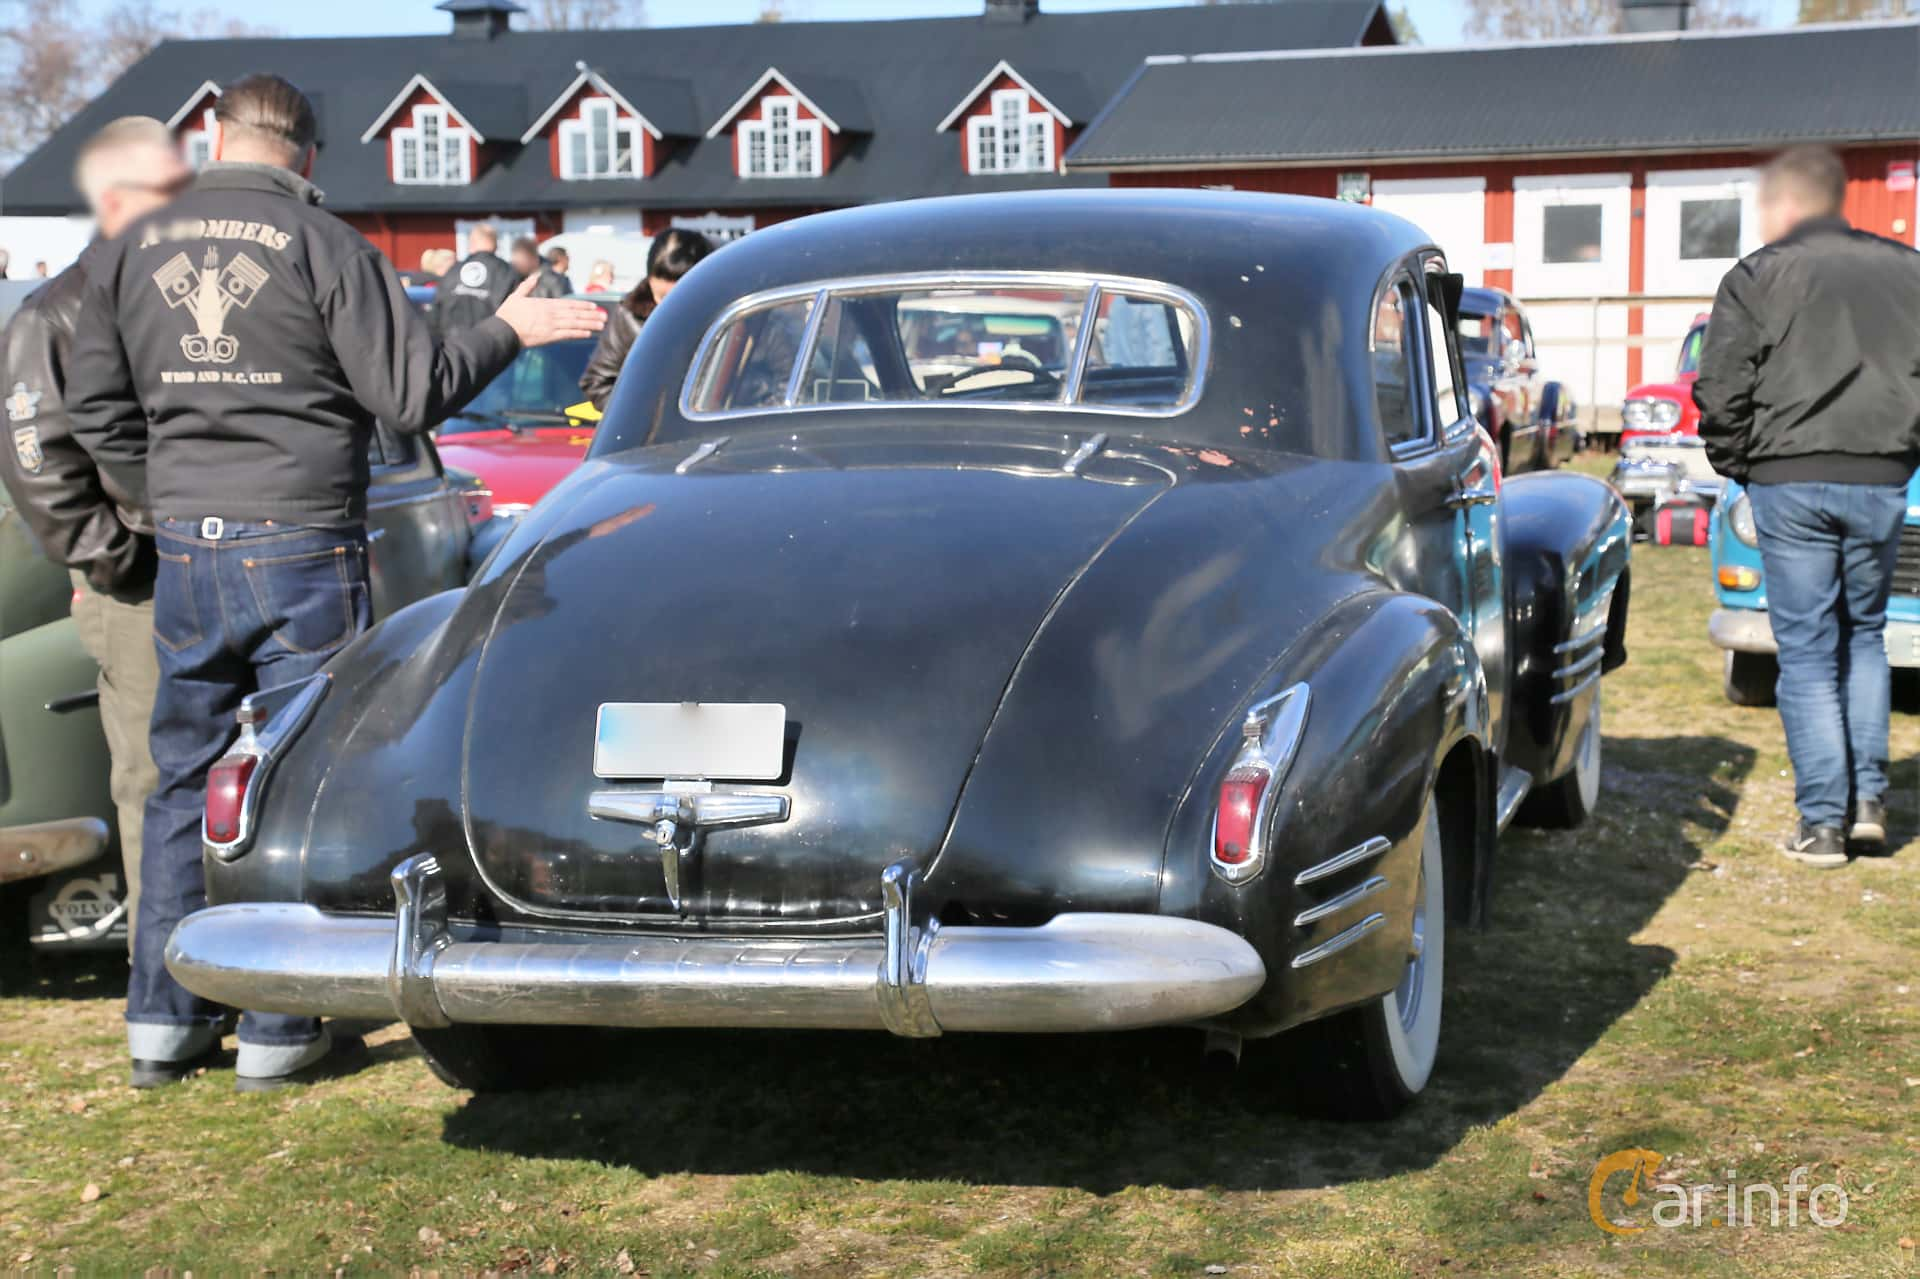 Cadillac Sixty-Two Coupé 5.7 V8 Hydra-Matic, 152hp, 1941 at Uddevalla Veteranbilsmarknad Backamo, Ljungsk 2019